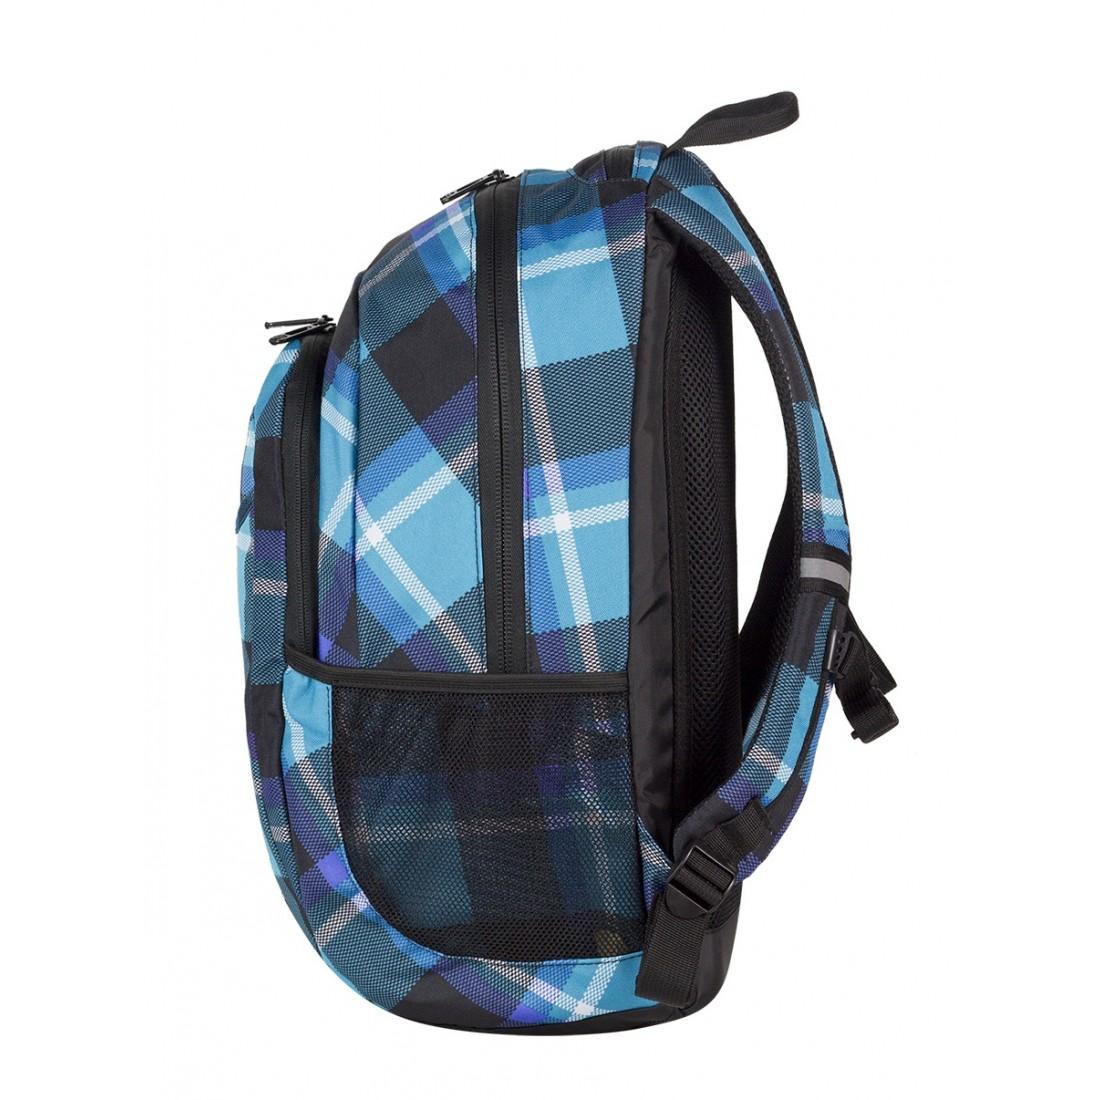 Plecak młodzieżowy CoolPack CP niebieski w kratkę URBAN SCOTT 386 - plecak-tornister.pl